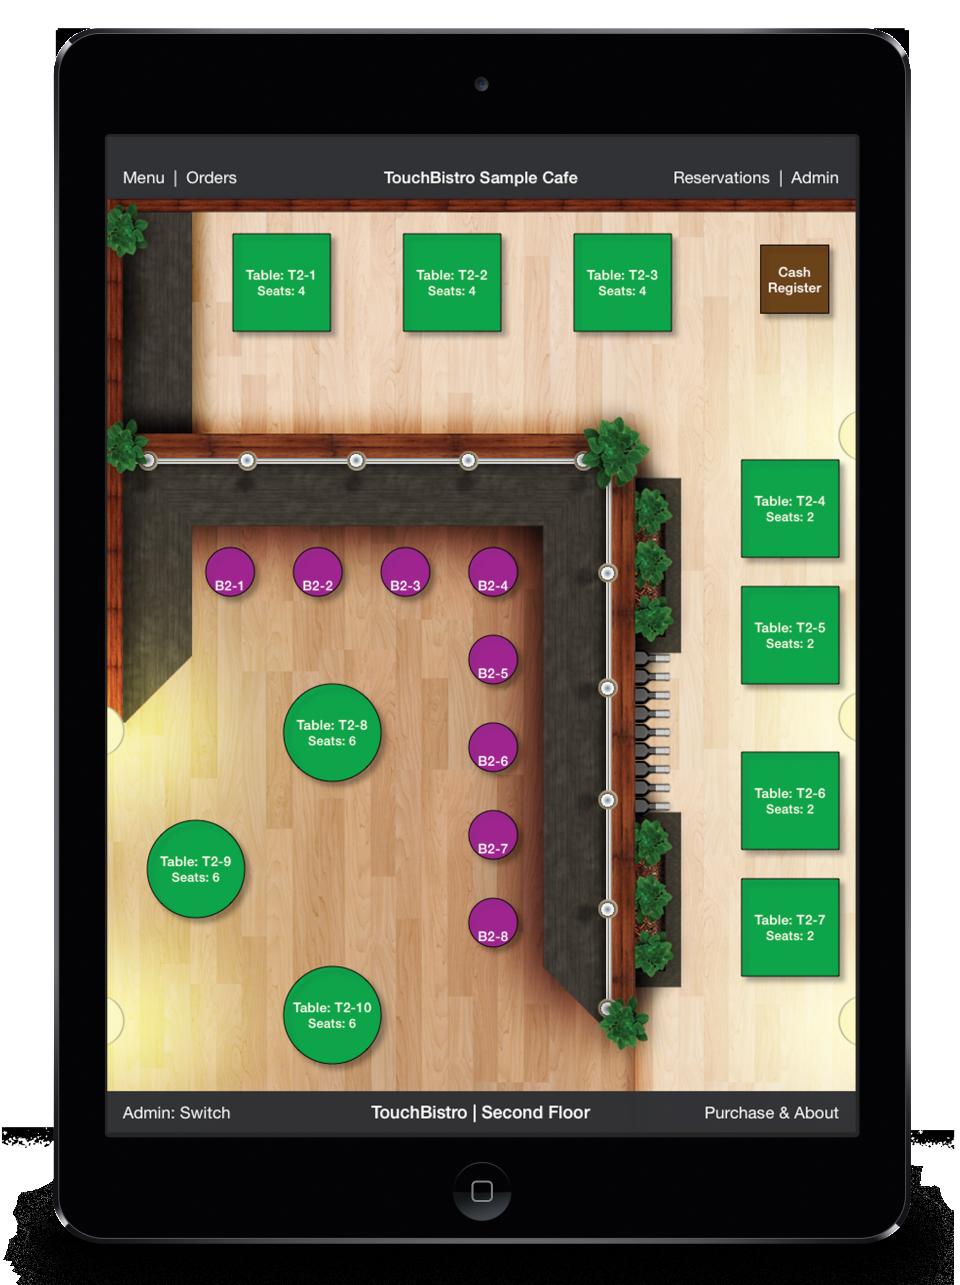 TouchBistro-screenshot-2